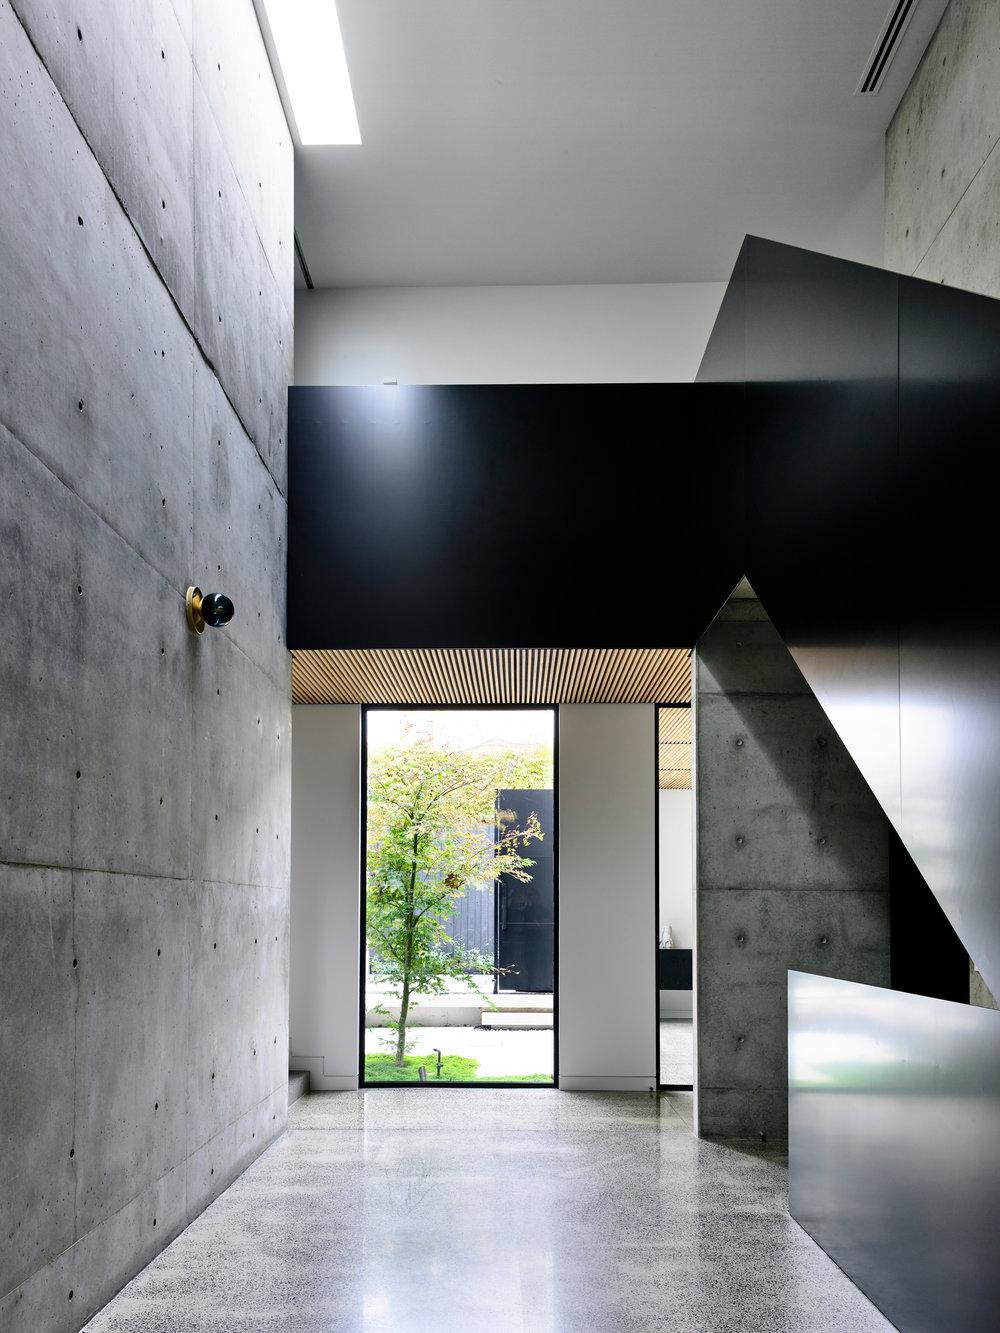 Light Vault house by chamberlain architects